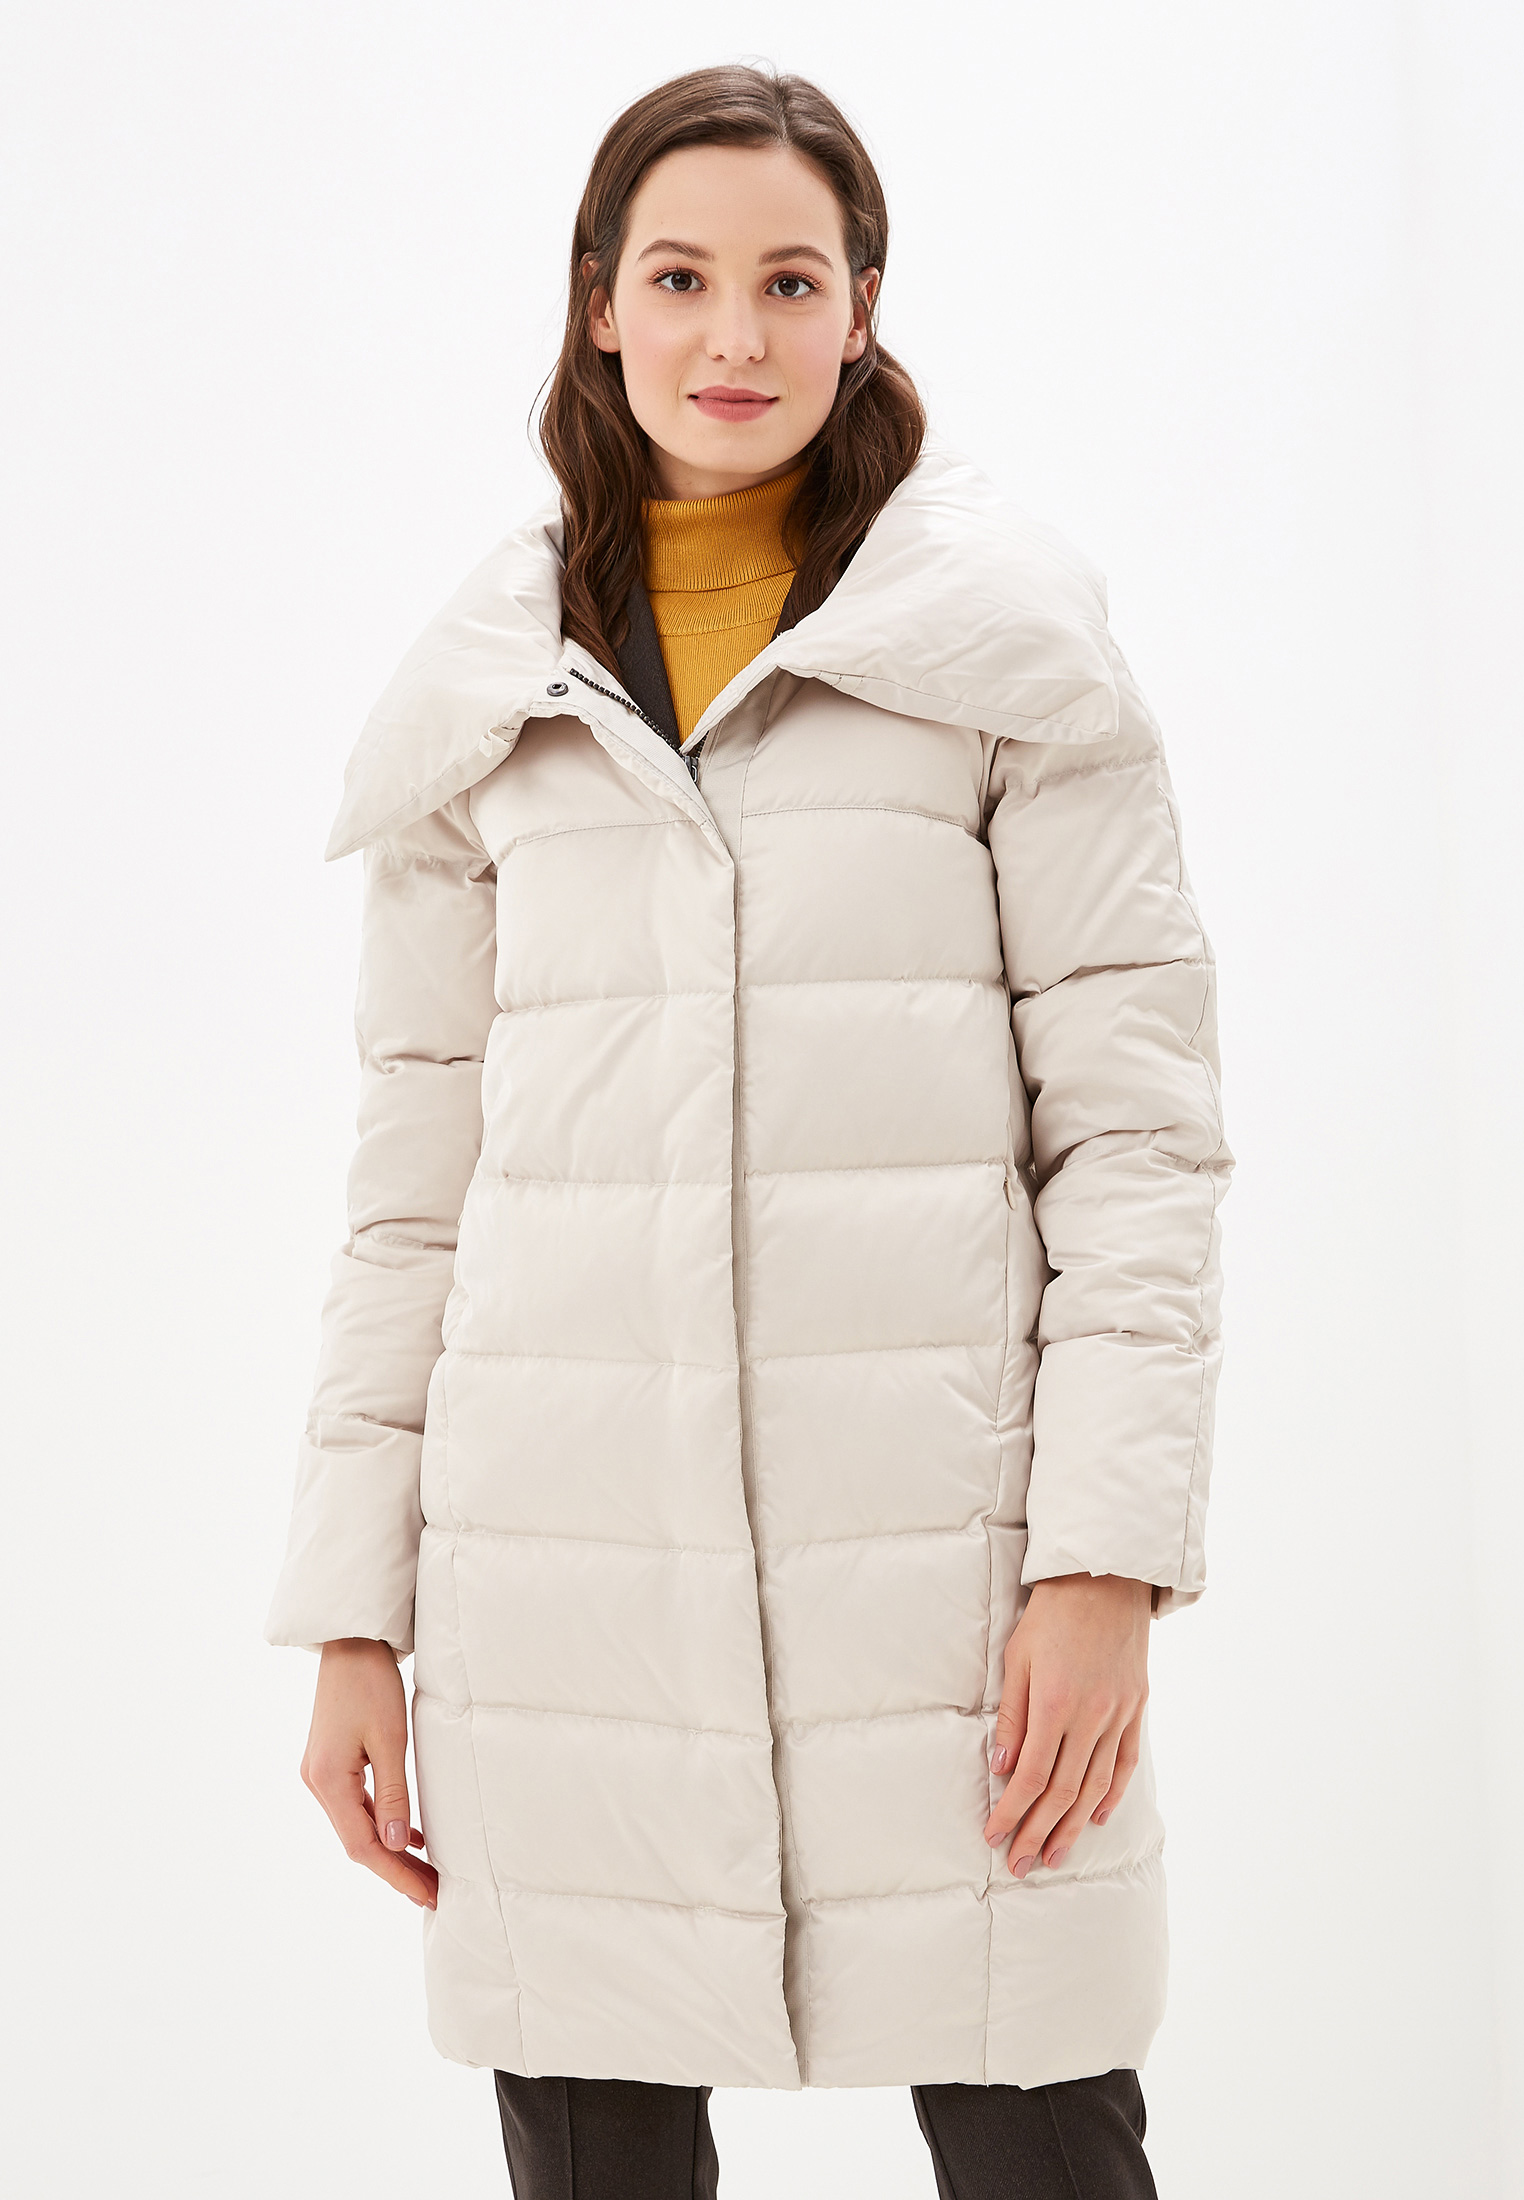 Пуховик, Savage, цвет: белый. Артикул: SA004EWGESB6. Одежда / Верхняя одежда / Пуховики и зимние куртки